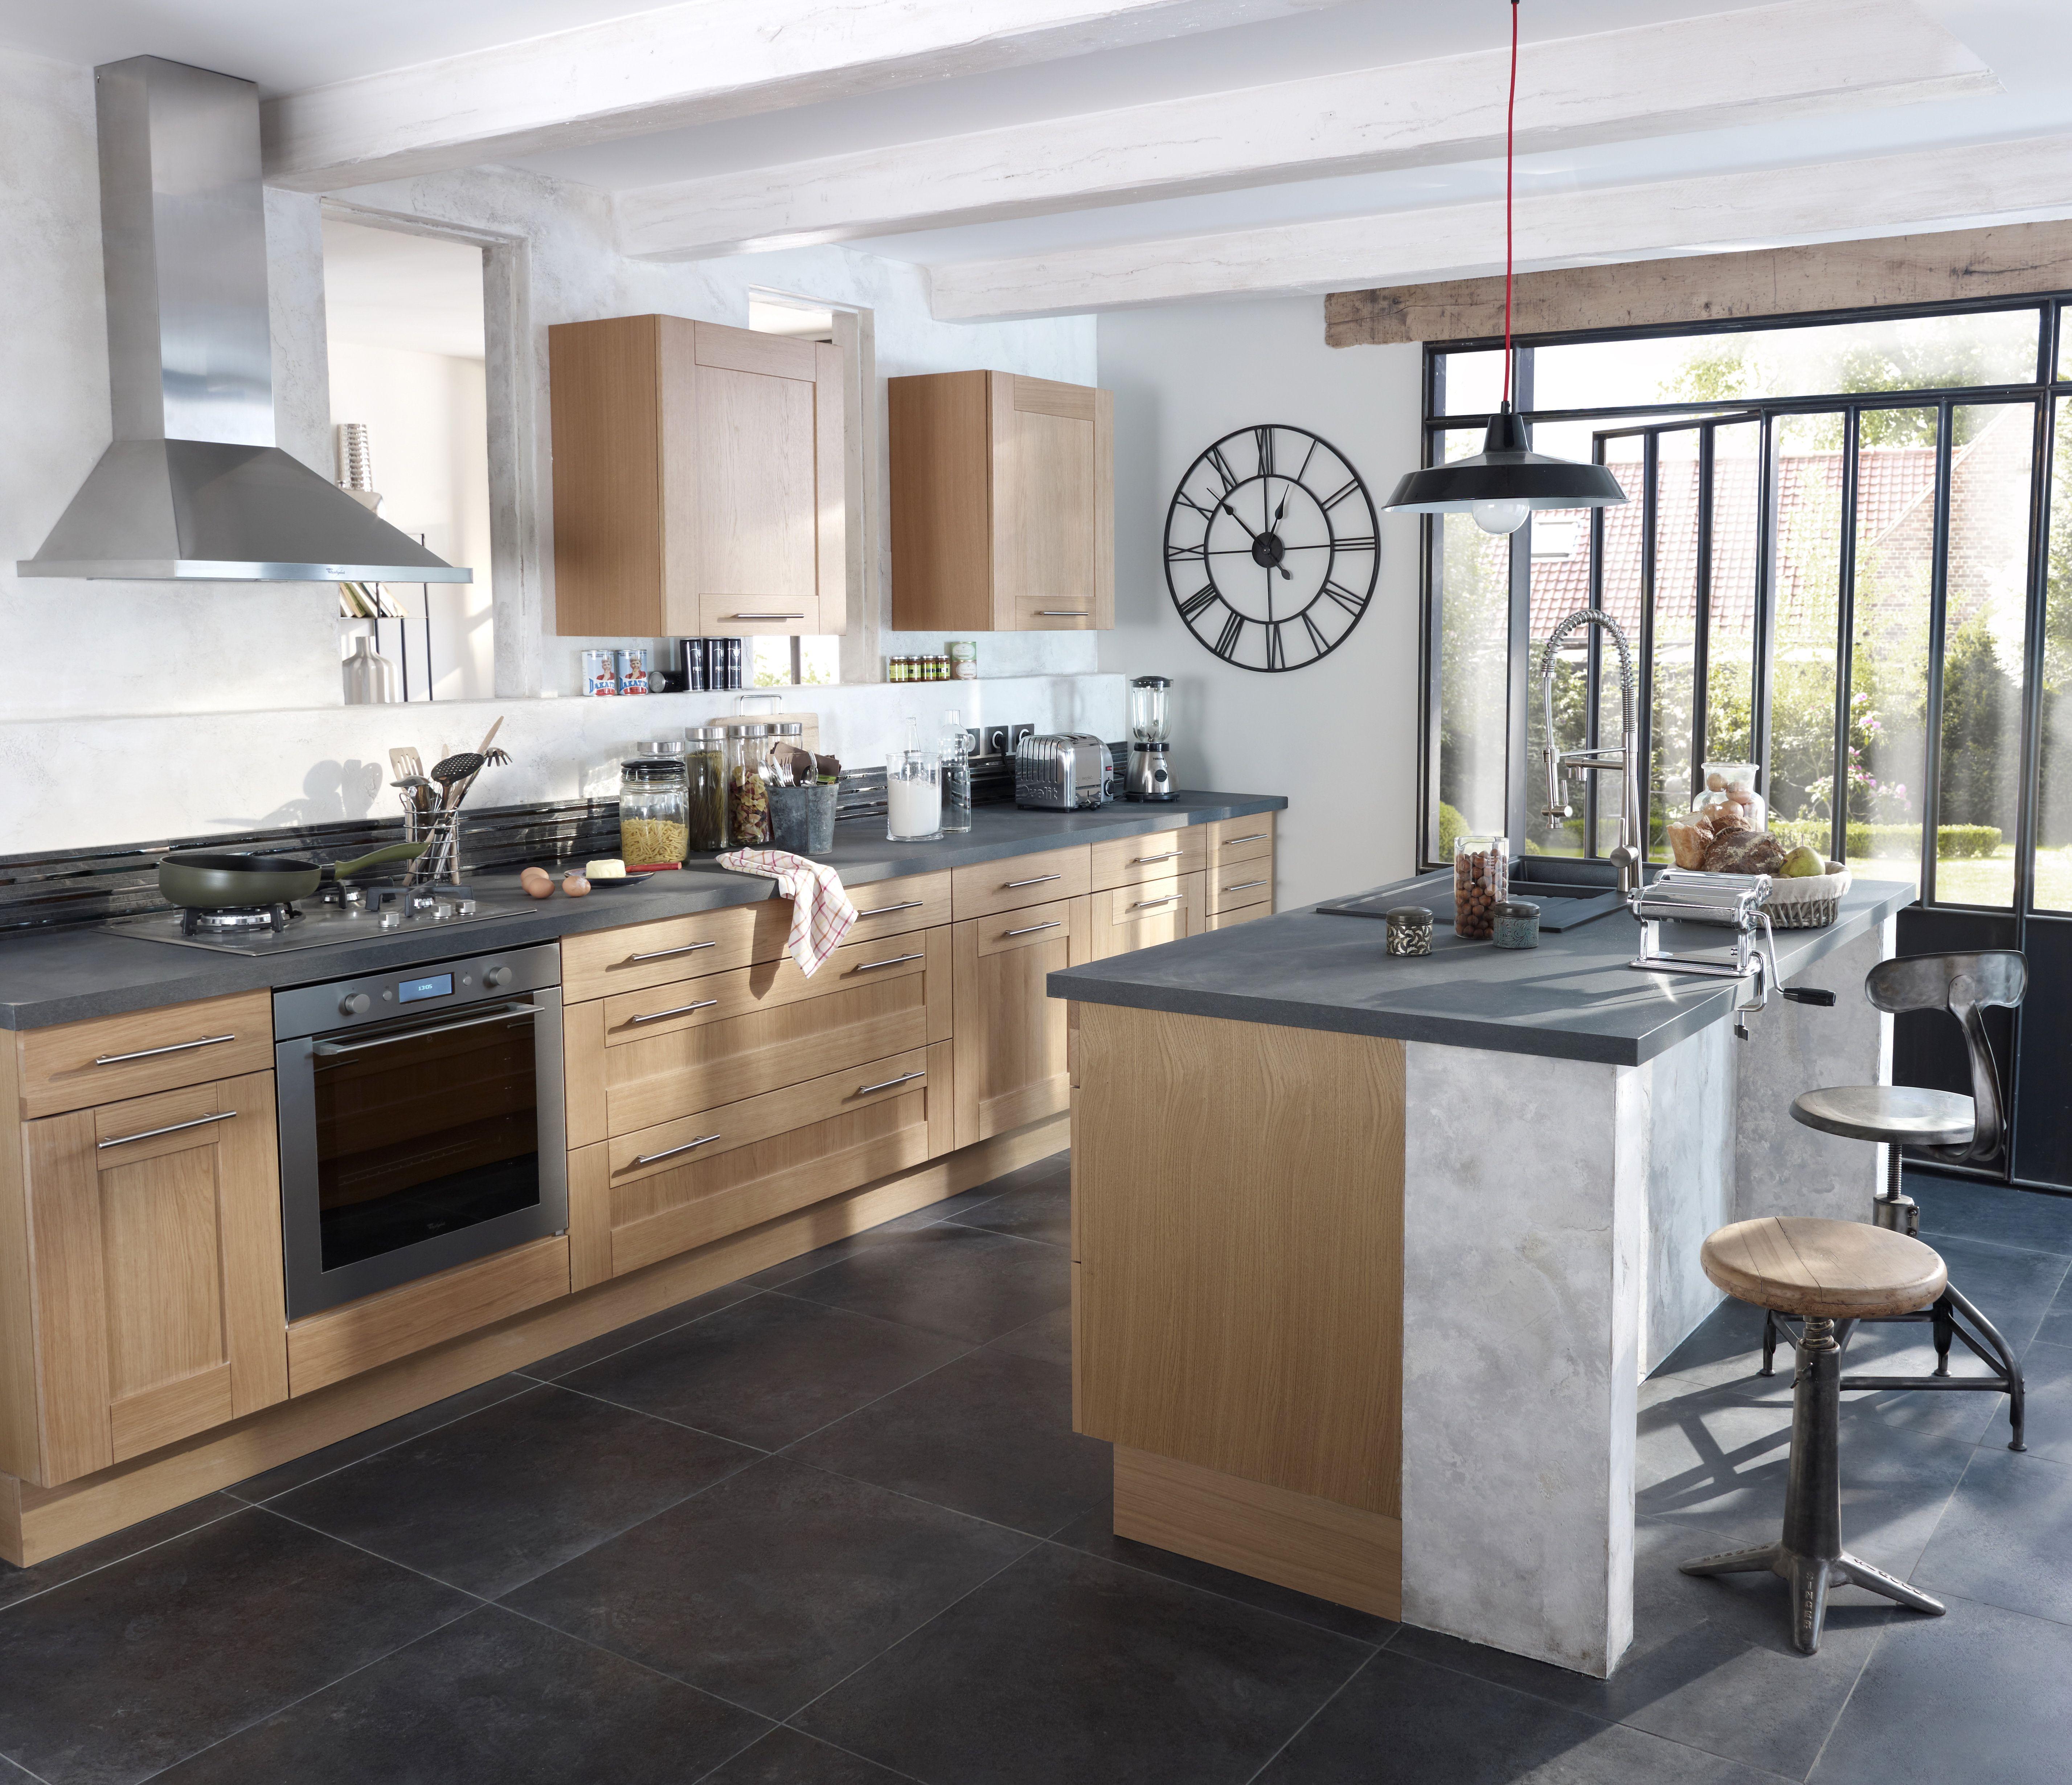 cuisine cooke lewis kadral kitchens pinterest cuisine kitchens and house. Black Bedroom Furniture Sets. Home Design Ideas